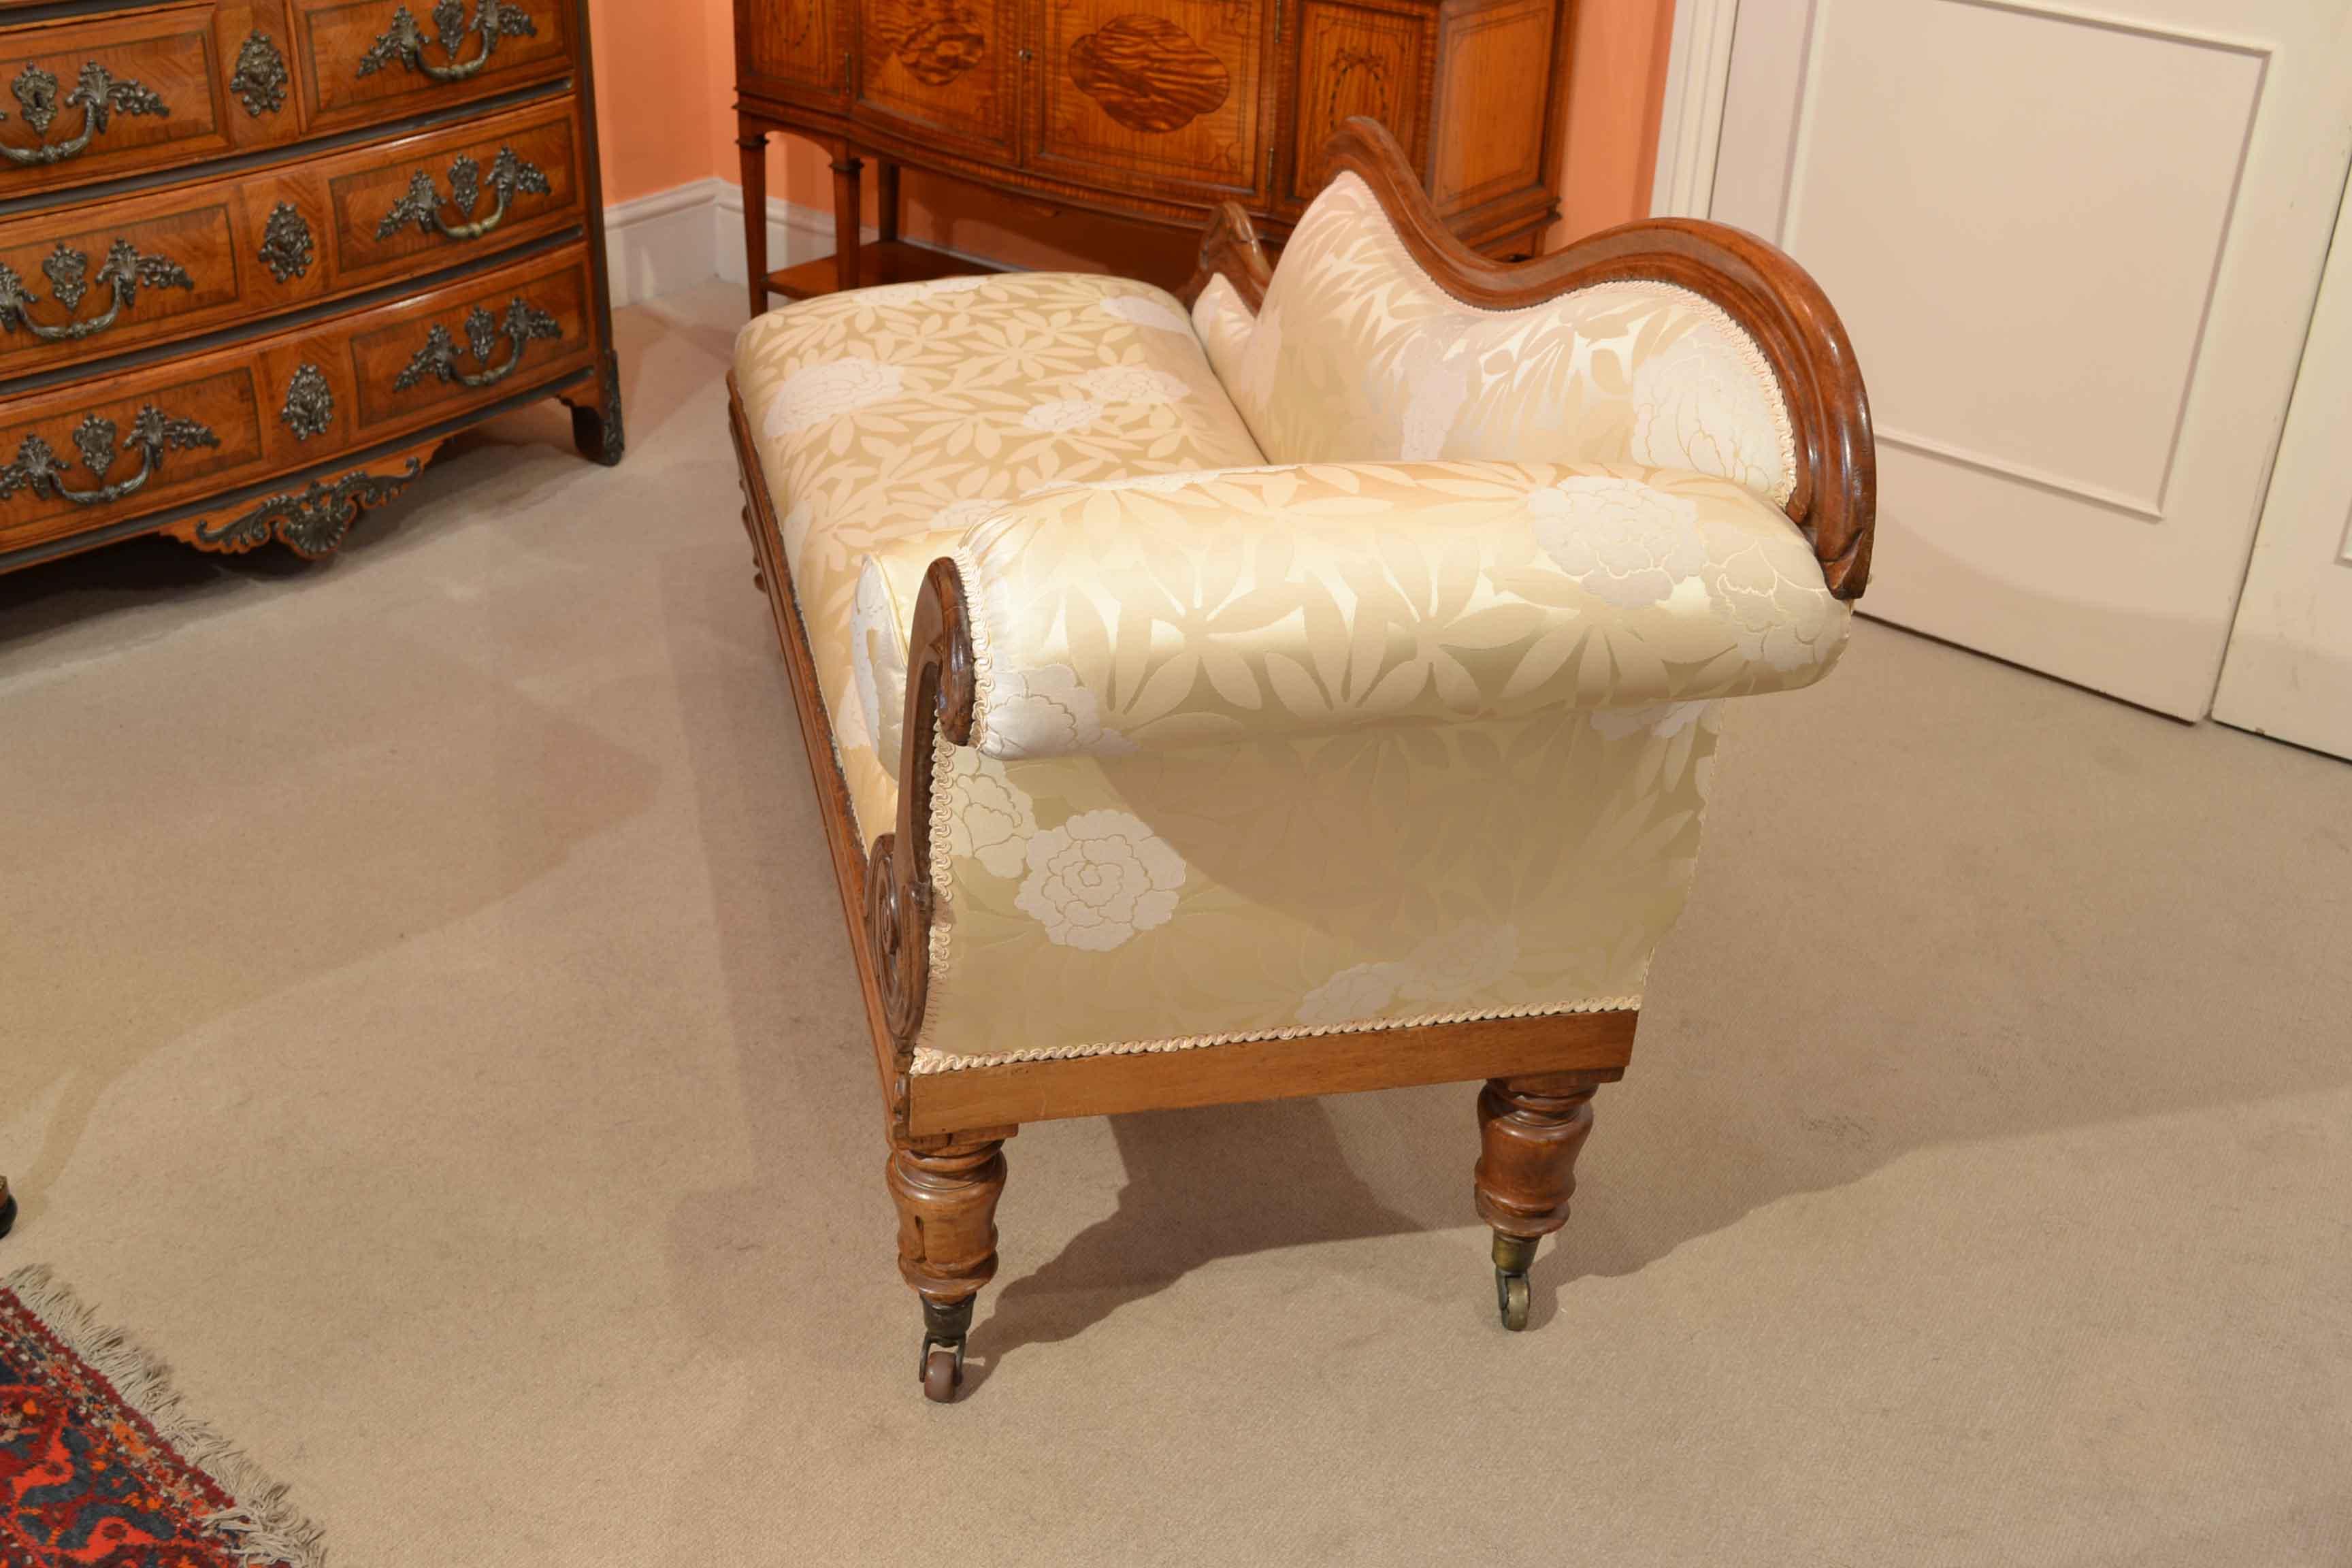 regent antiques sofas and stools antique william iv chaise longue sofa circa 1830. Black Bedroom Furniture Sets. Home Design Ideas